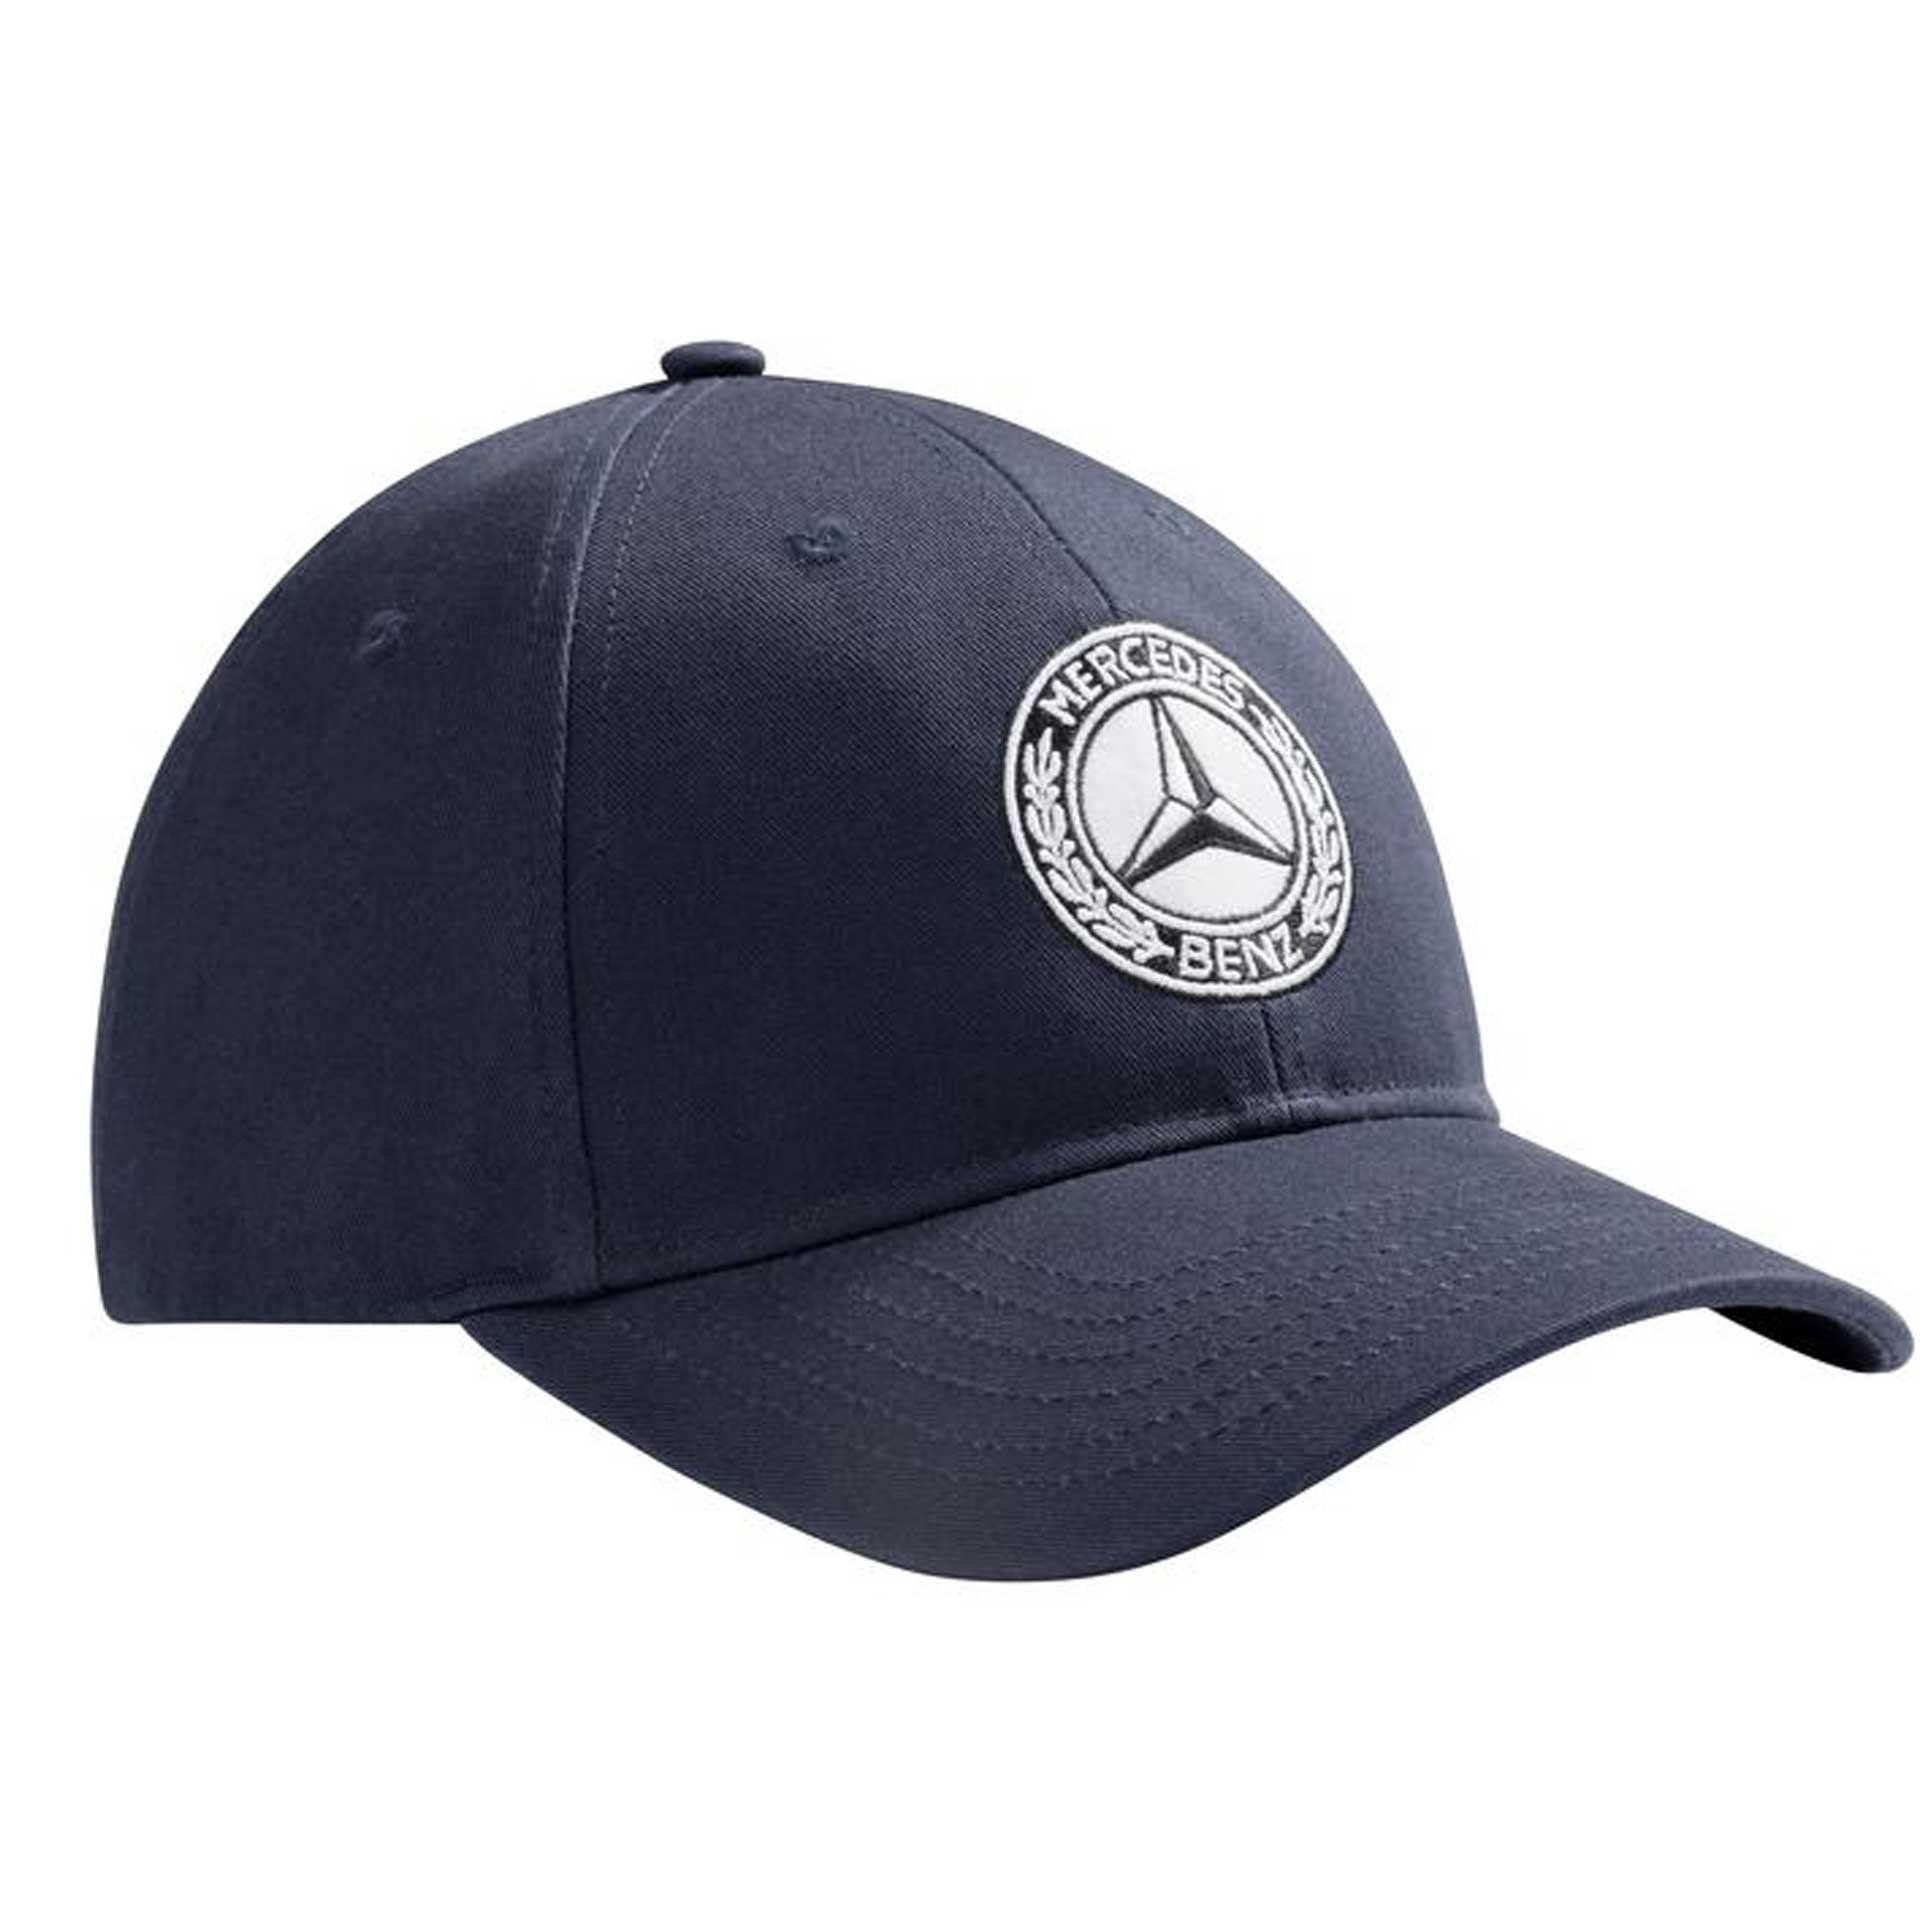 Mercedes-Benz Cap Kappe Basecap Classic Collection Navy